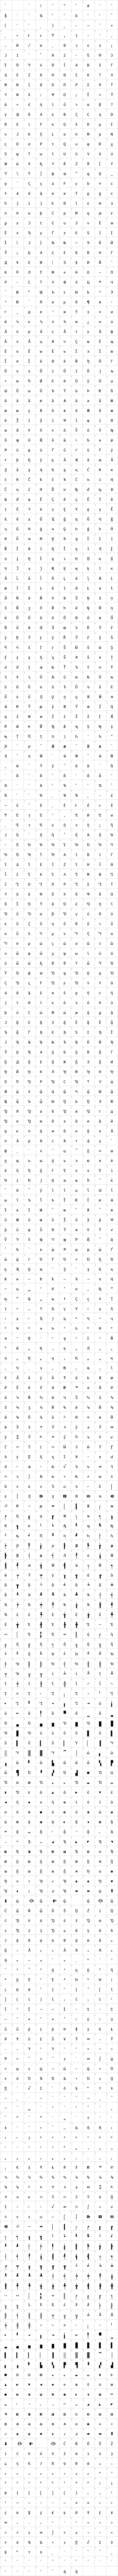 Fira Mono Font Free by Mozilla » Font Squirrel